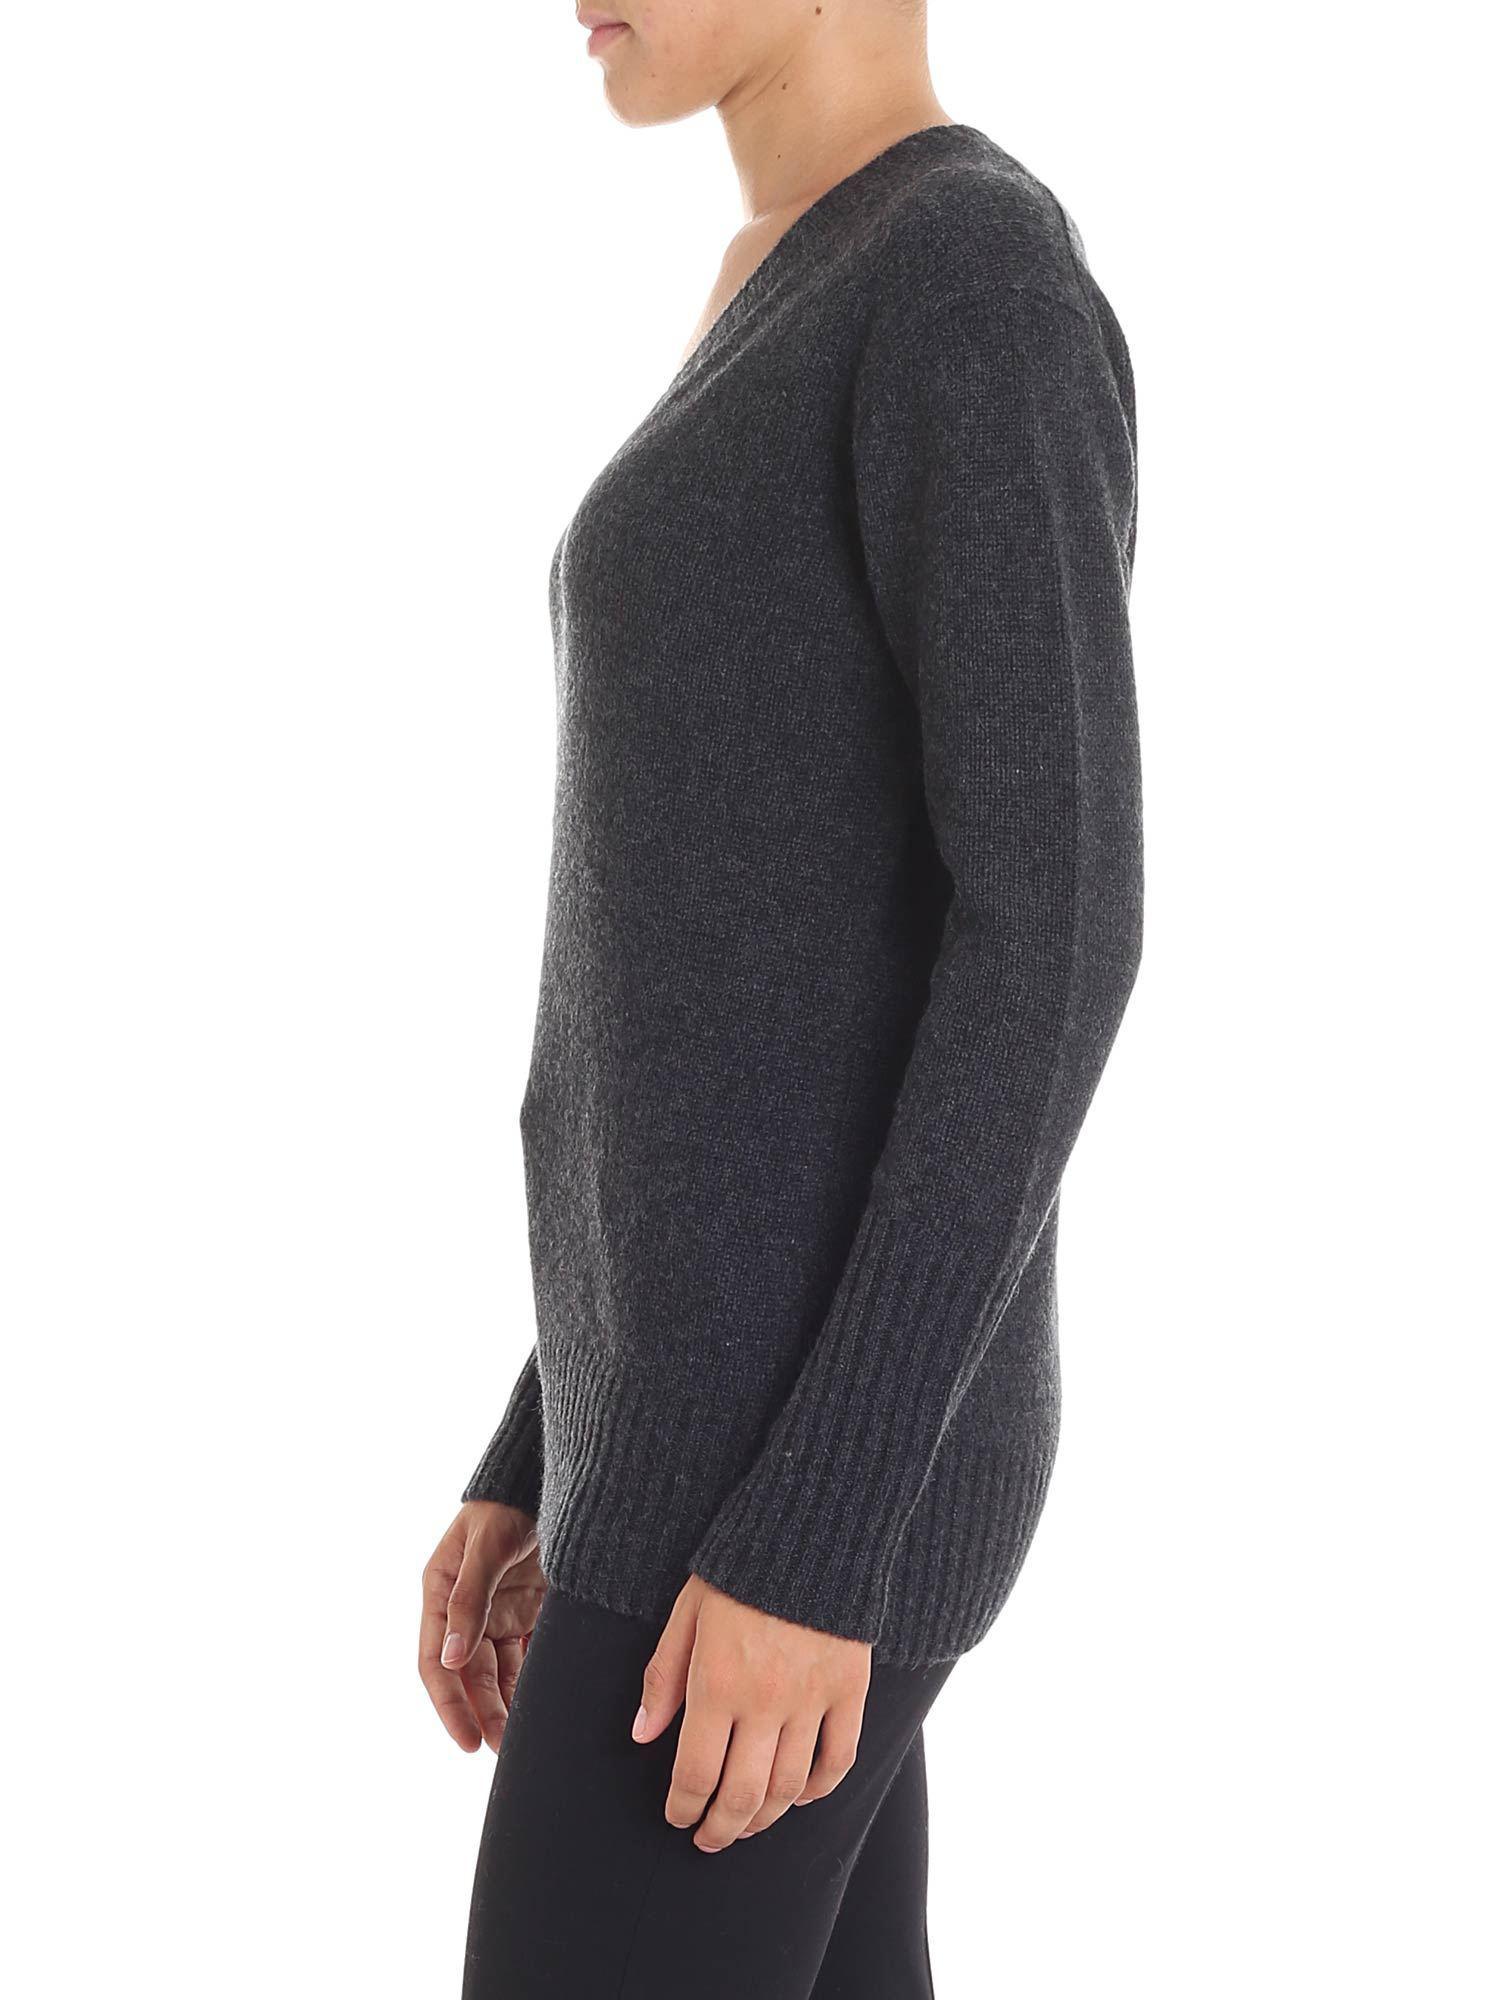 1a858883cd5 360cashmere Dark Grey Cashmere Runa Sweater in Gray - Lyst